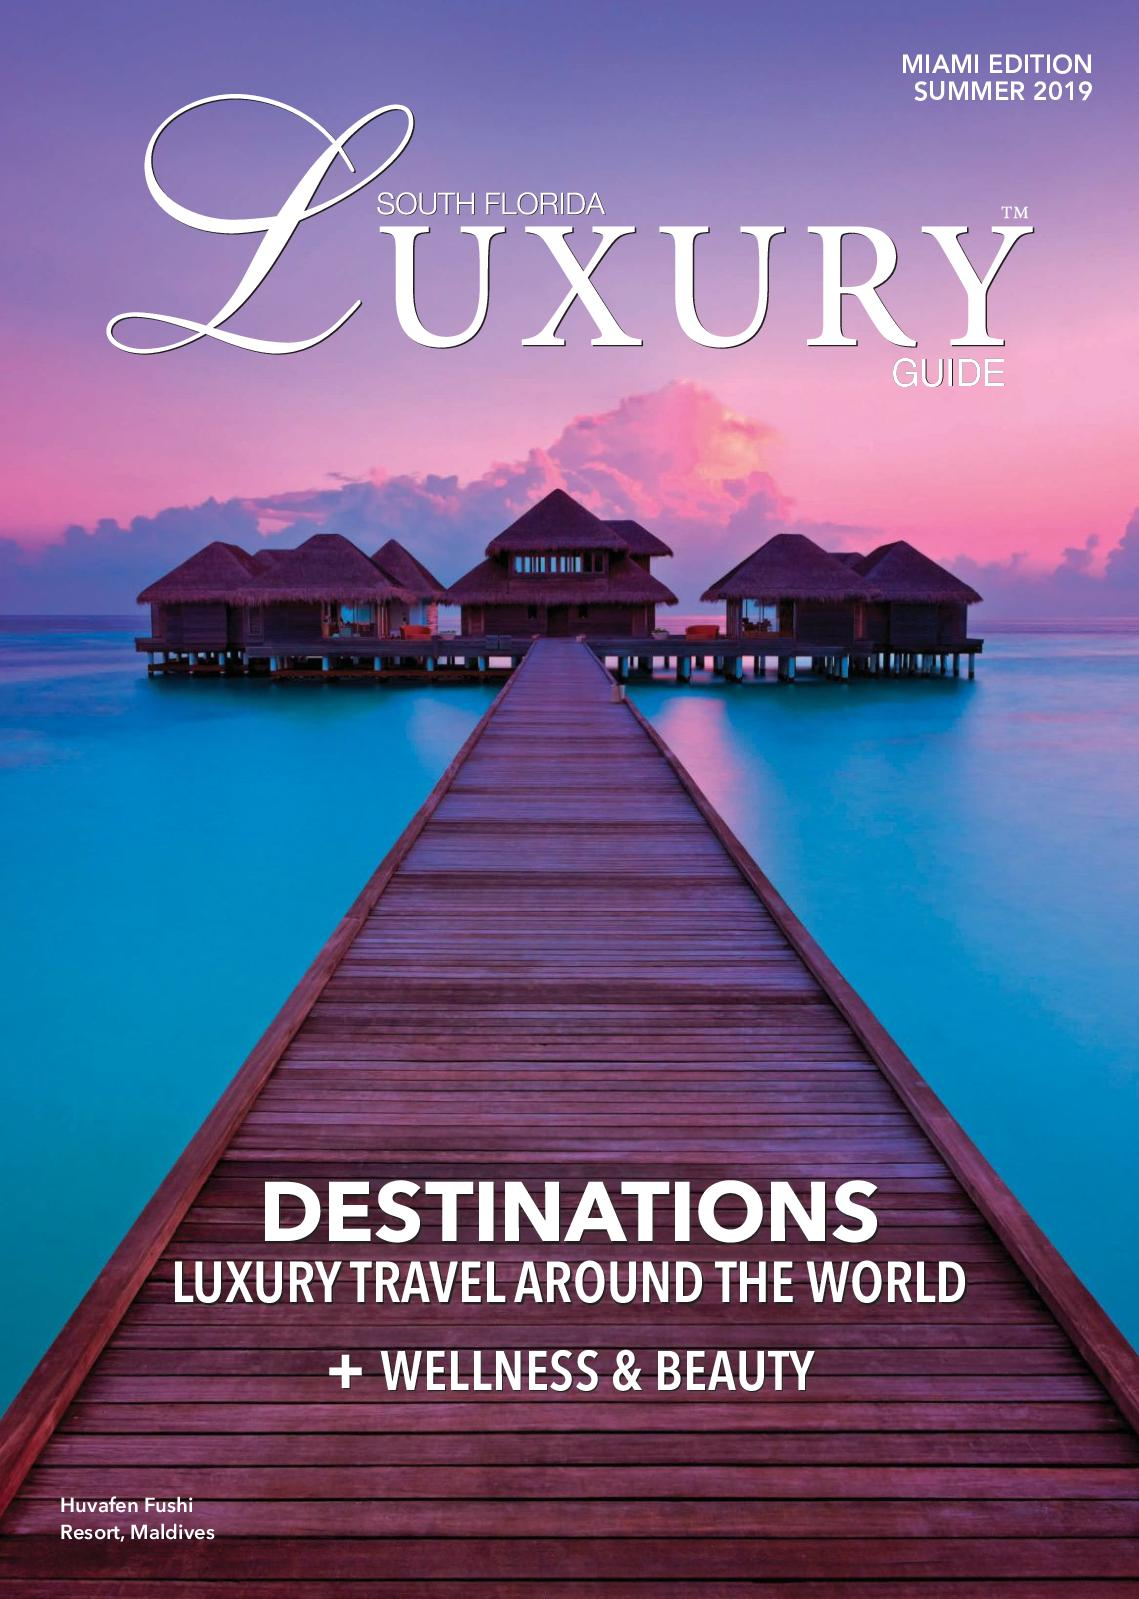 Calaméo - Luxury Magazine Summer 2019